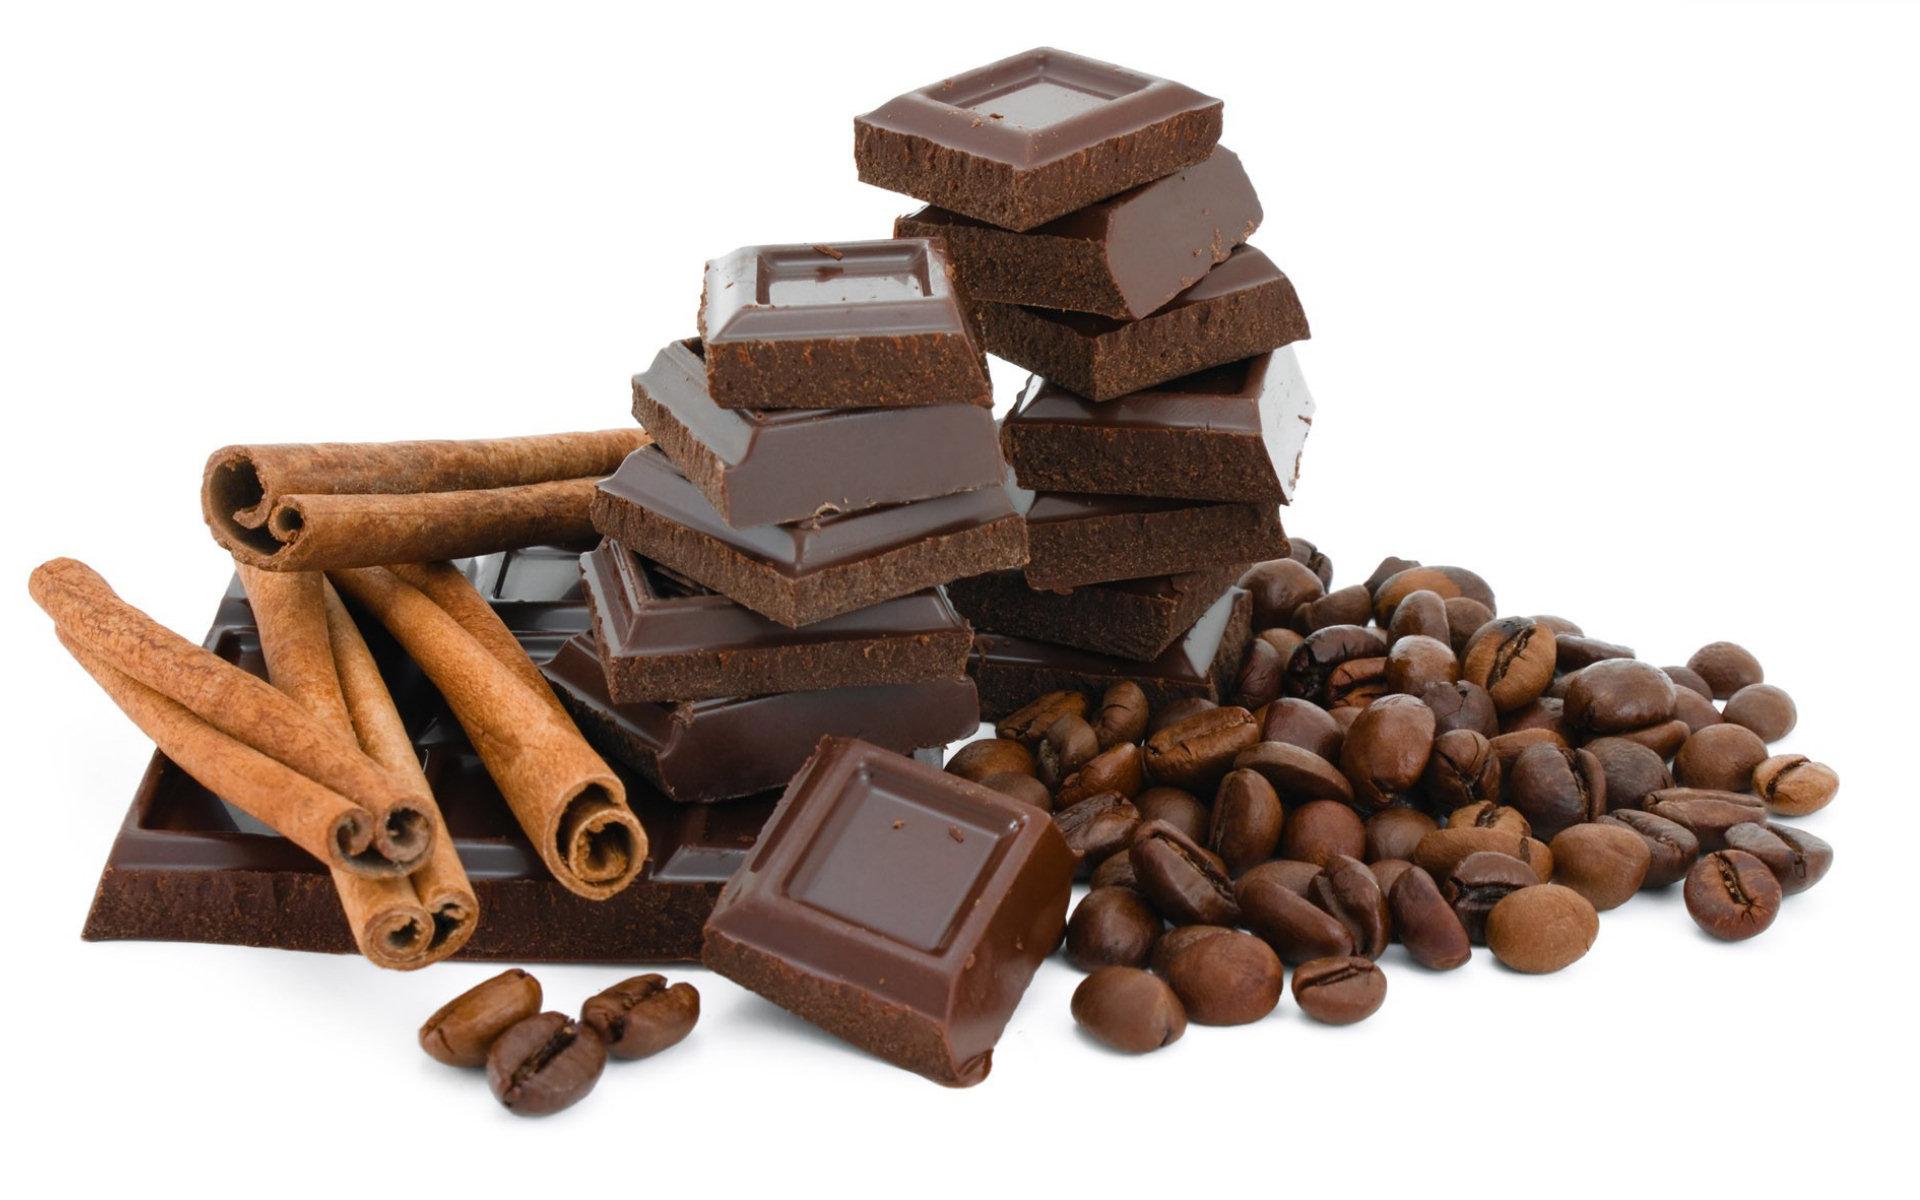 hinh nen chocolate 40